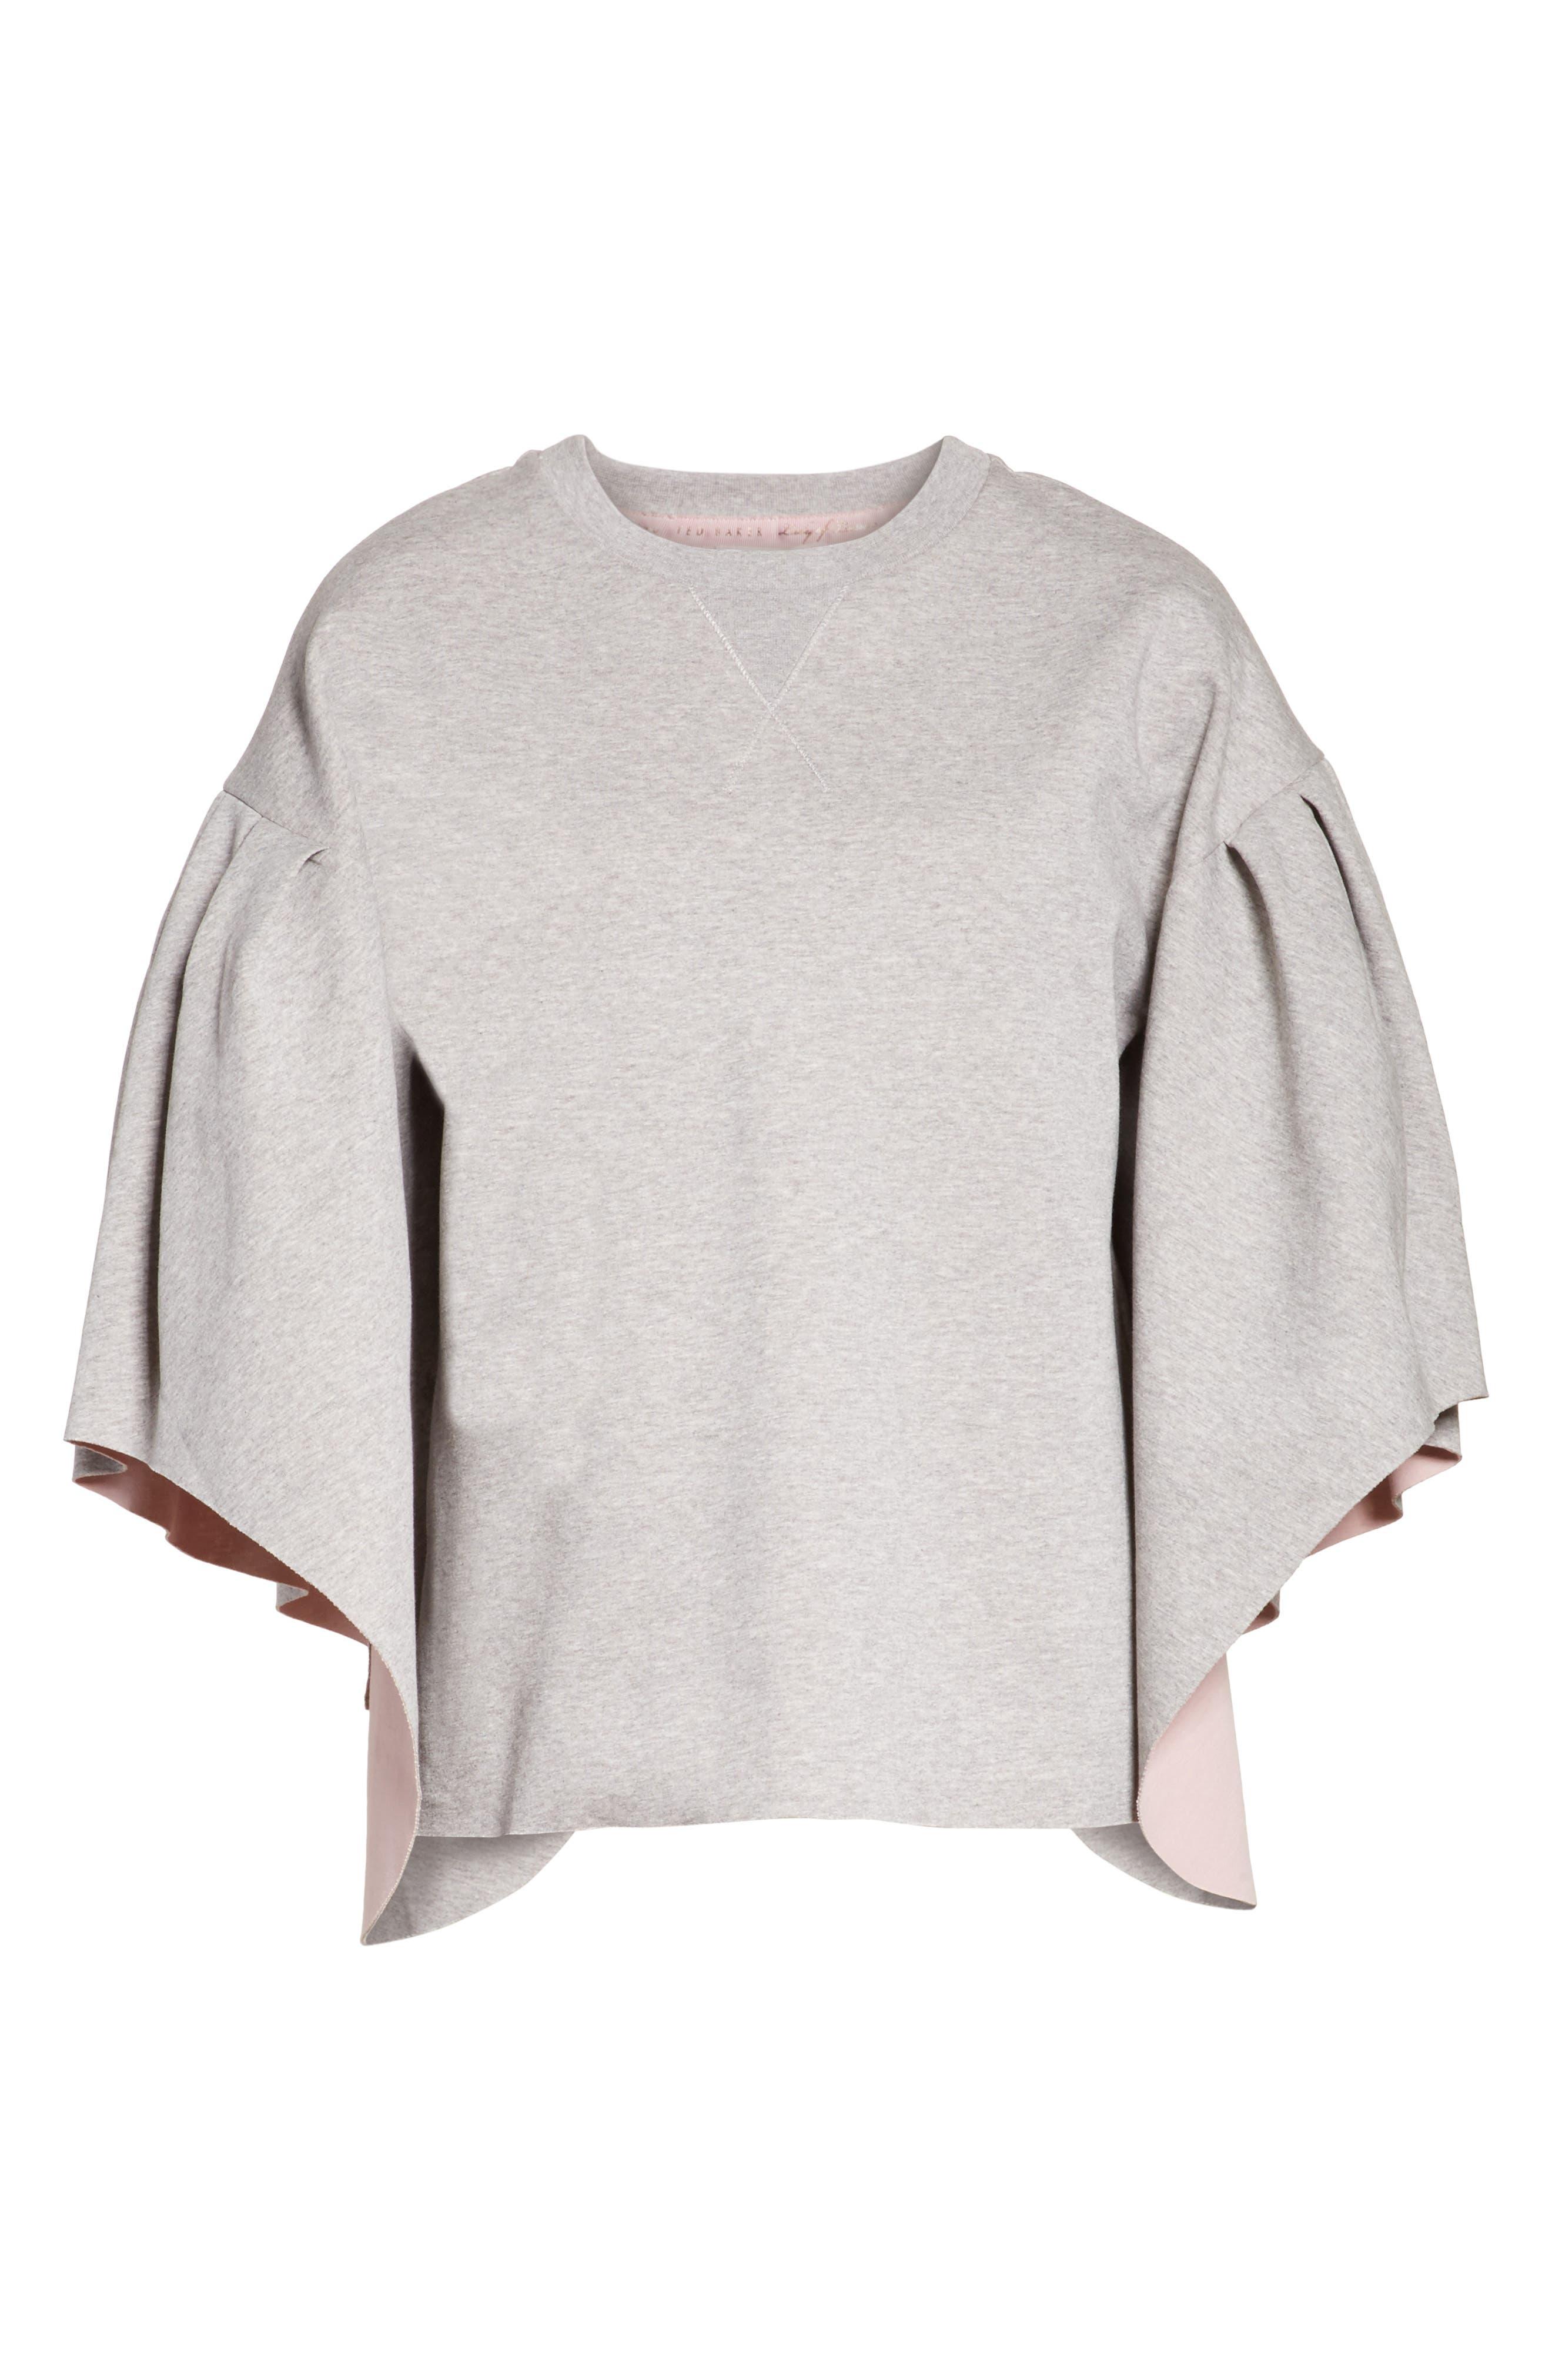 Orcher Full Sleeve Sweatshirt,                             Alternate thumbnail 17, color,